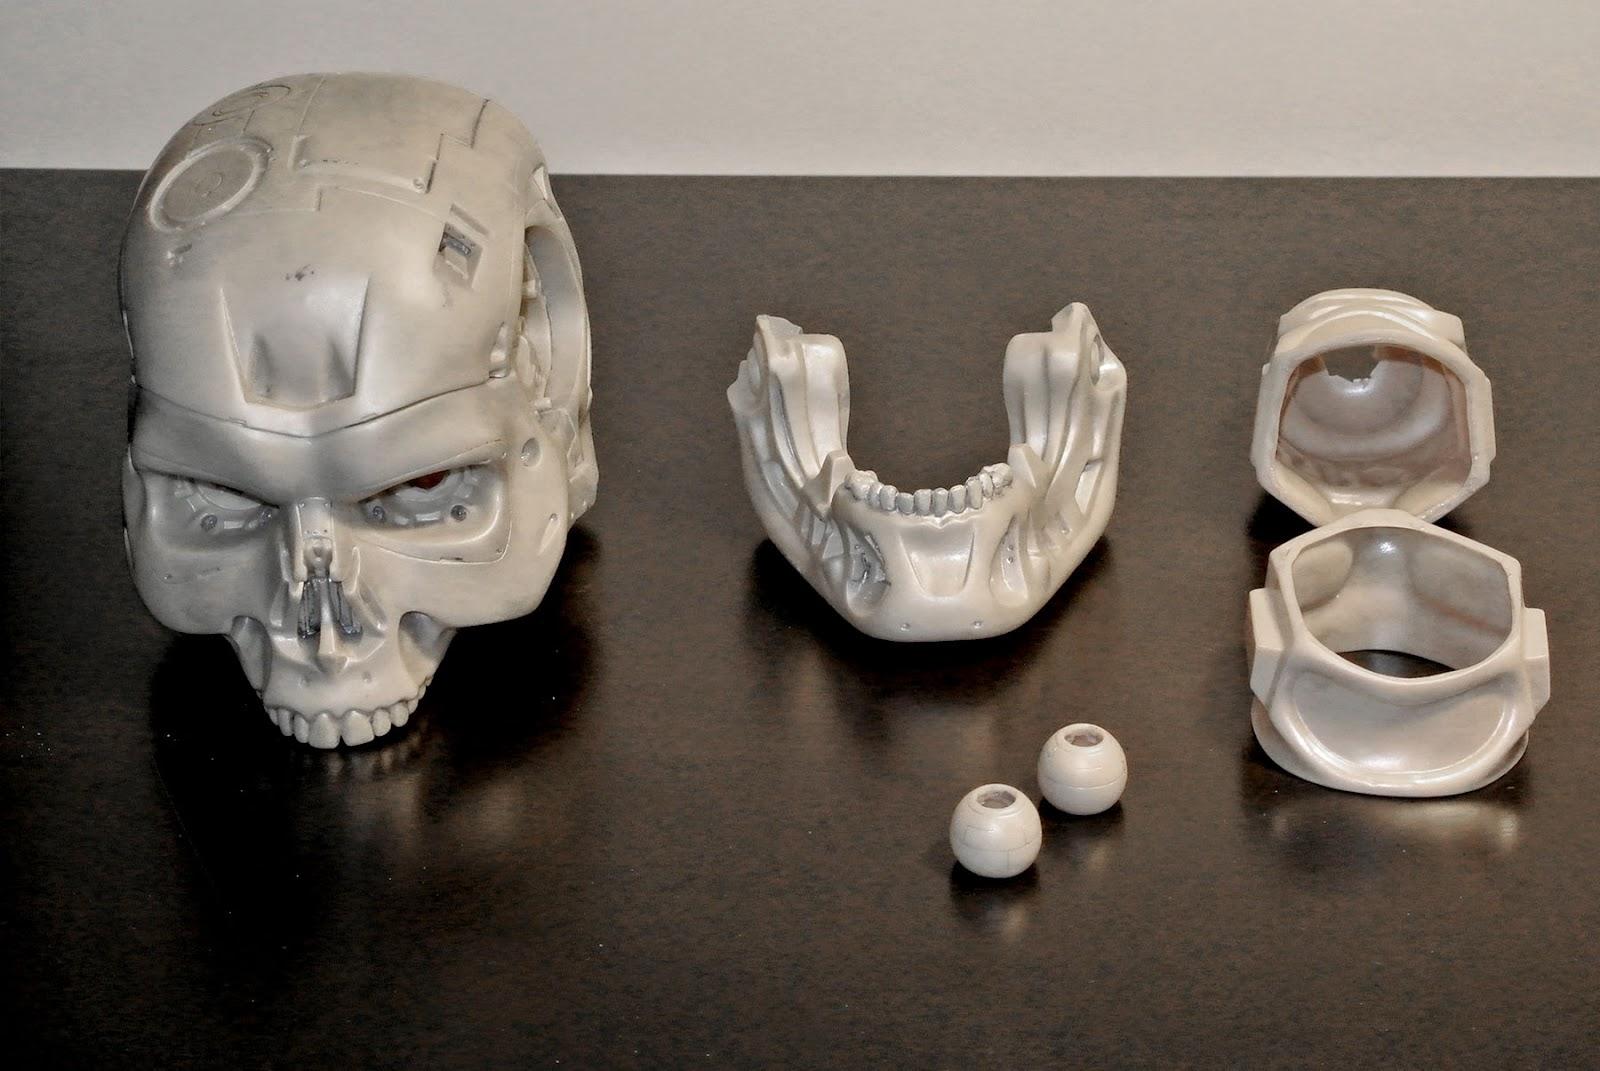 T800 101 Building A Terminator Endo Skull May 2014